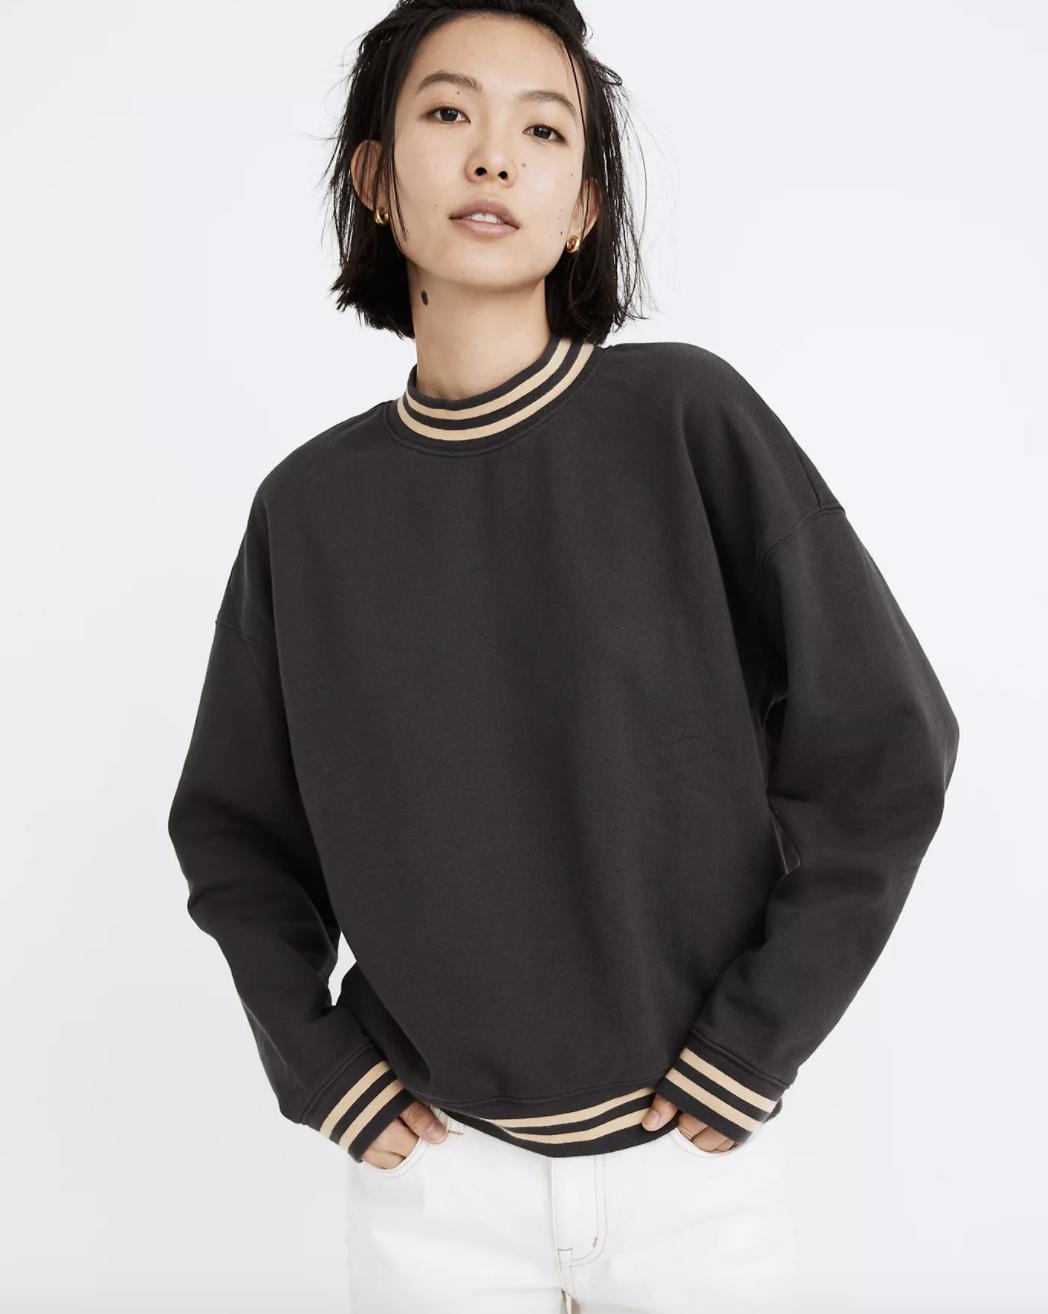 the black sweater